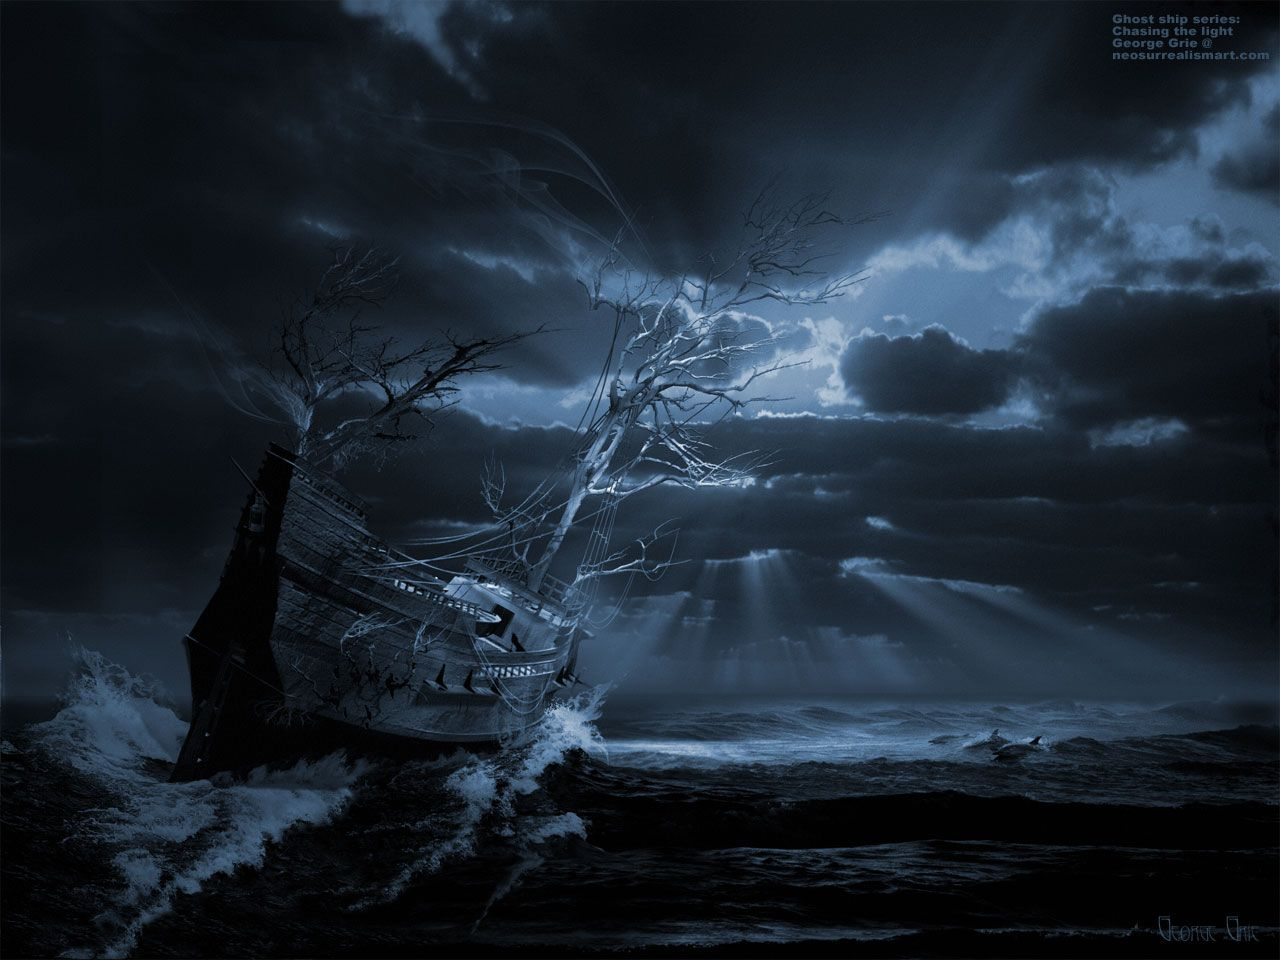 Fantasy ship cliff jolly roger pirate ship rock lightning wallpaper - Google Image Result For Http Neosurrealismart Com Modern Art Prints 3fimages Ghost Ship Series Chasing The Light Jpg George Grie